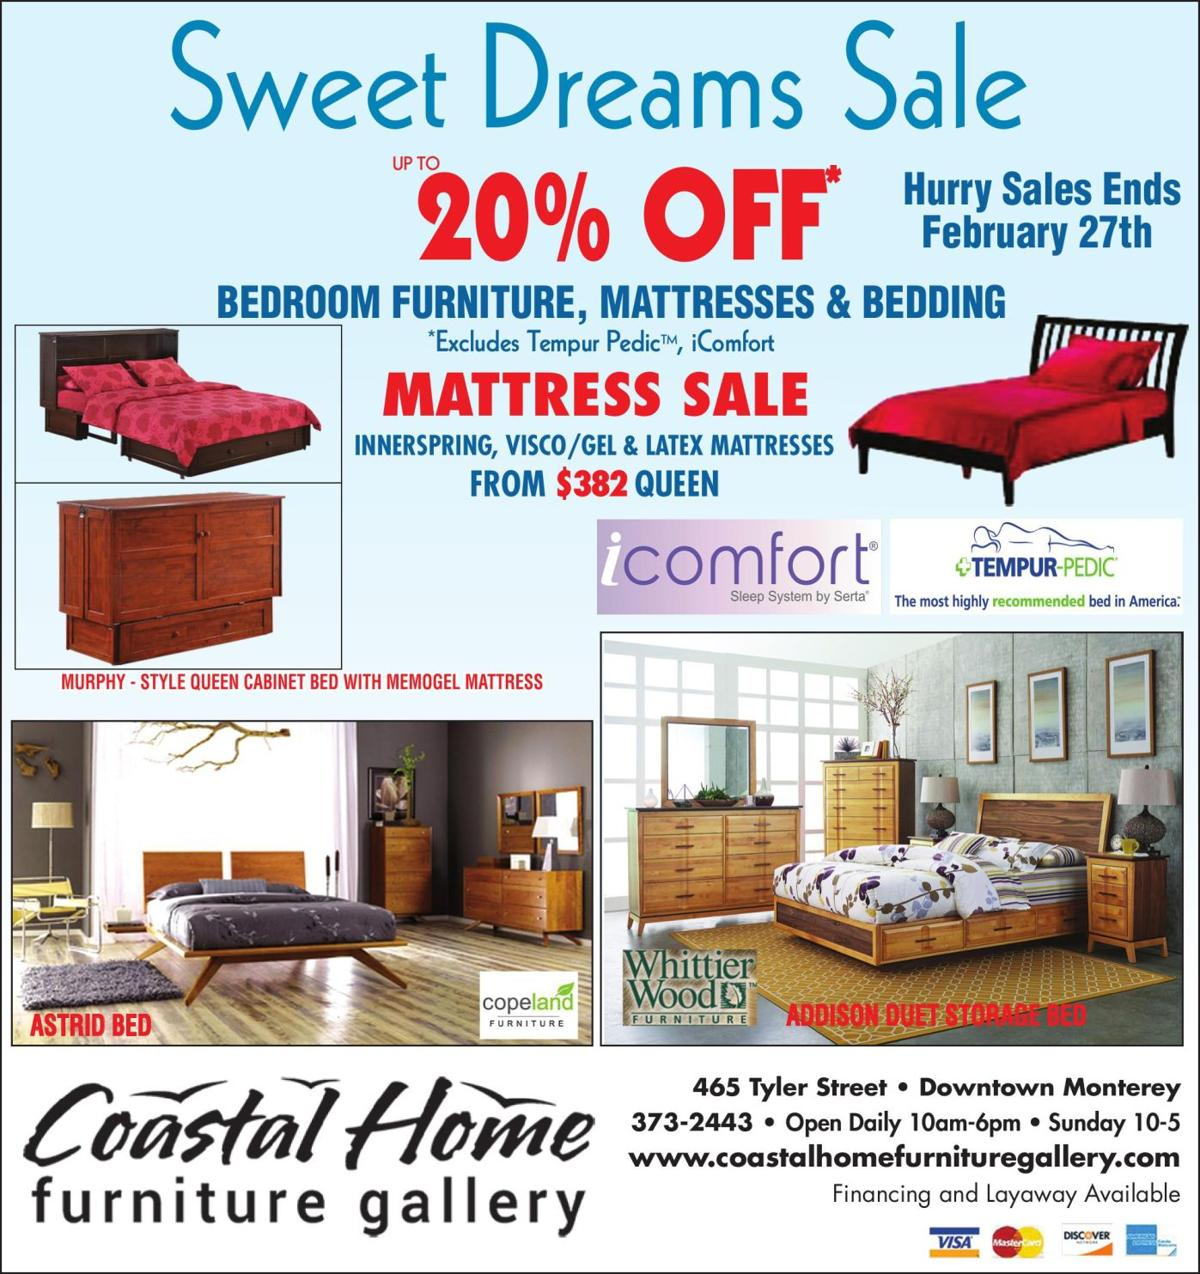 Coastal Home Furniture Gallery